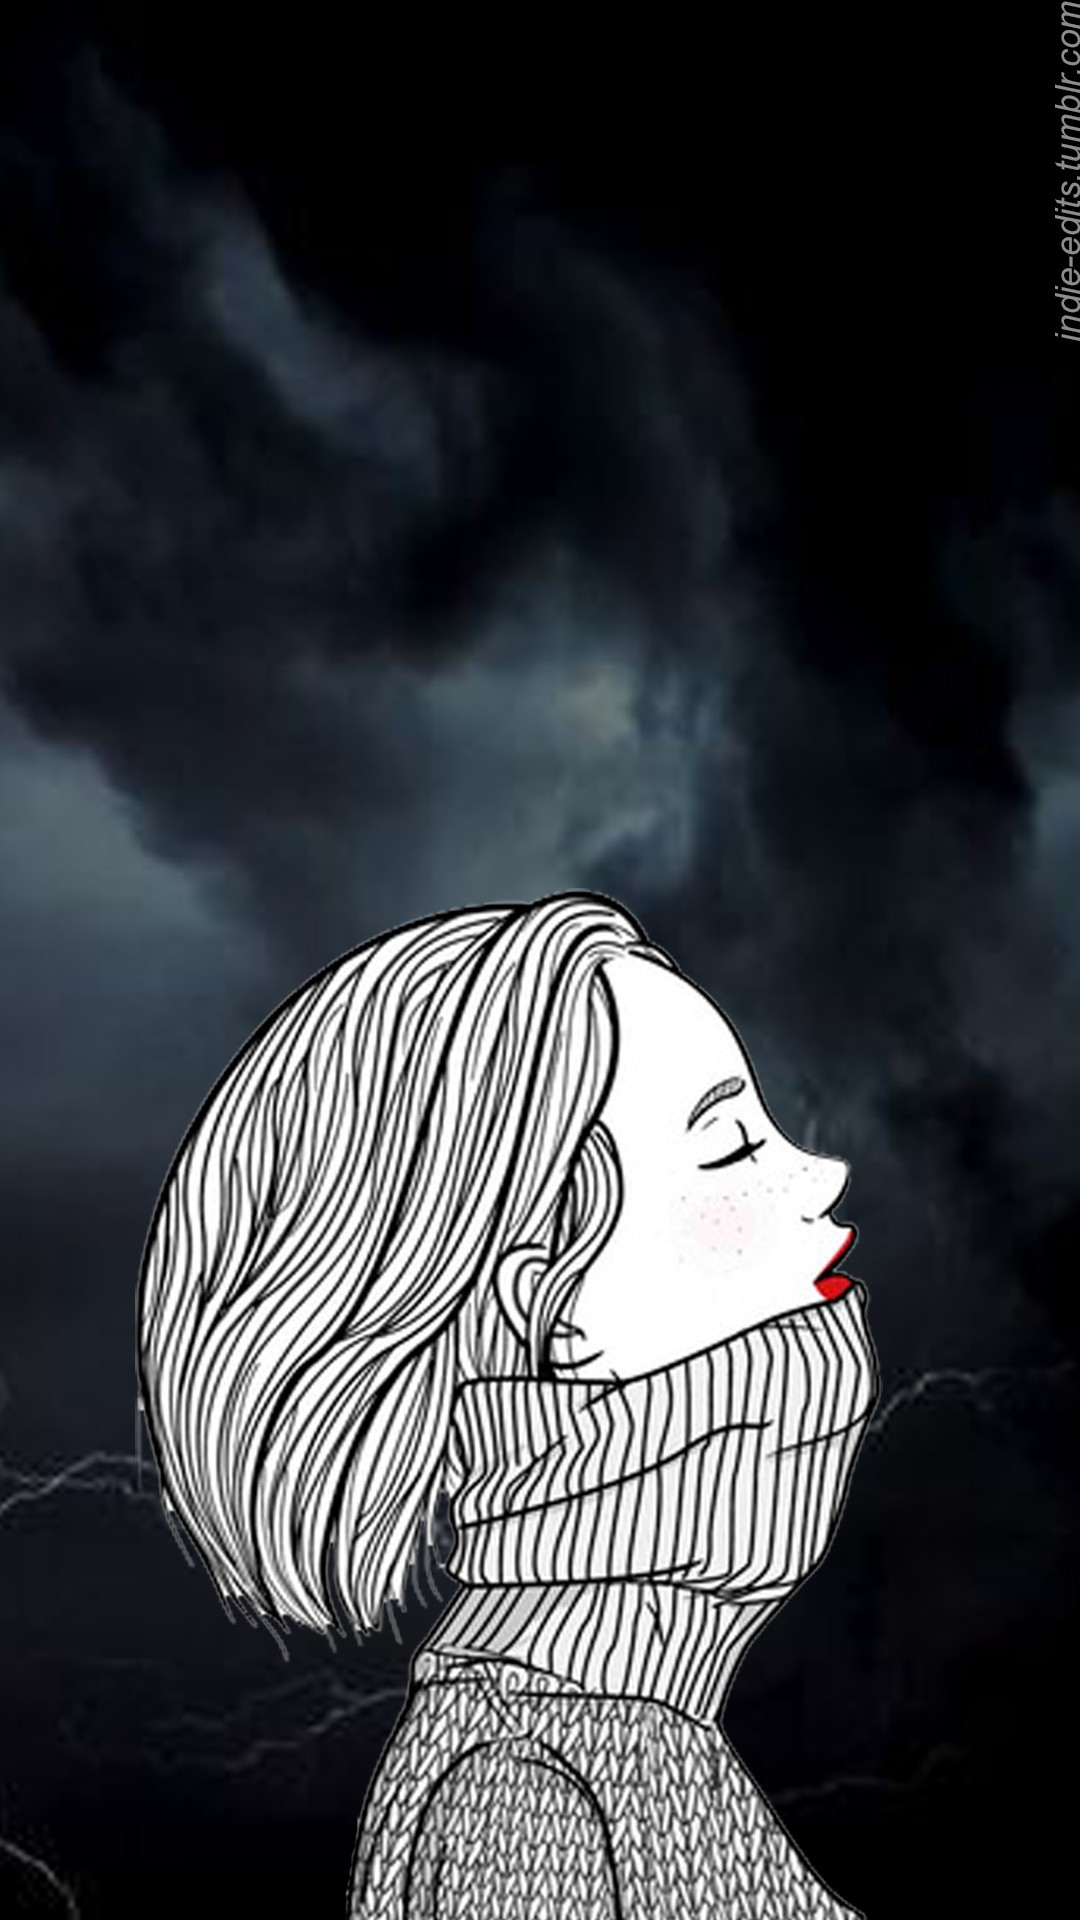 Sad Girl Wallpaper Iphone , HD Wallpaper & Backgrounds